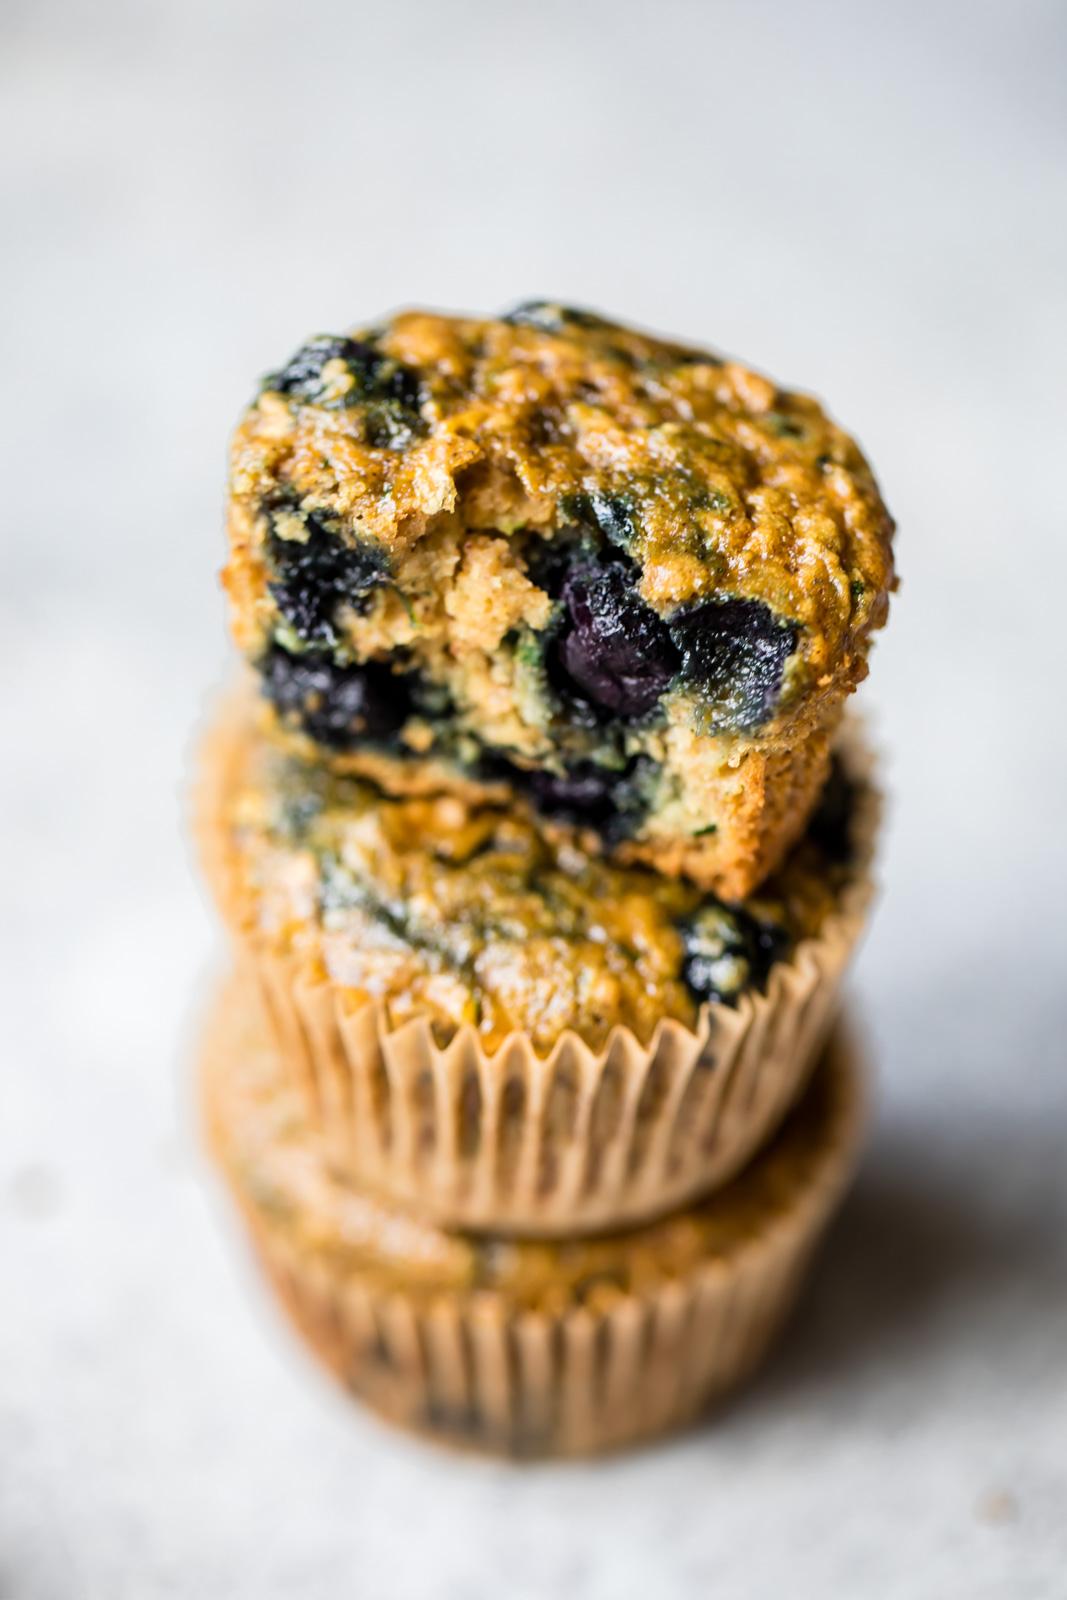 three blueberry zucchini muffins in a stack